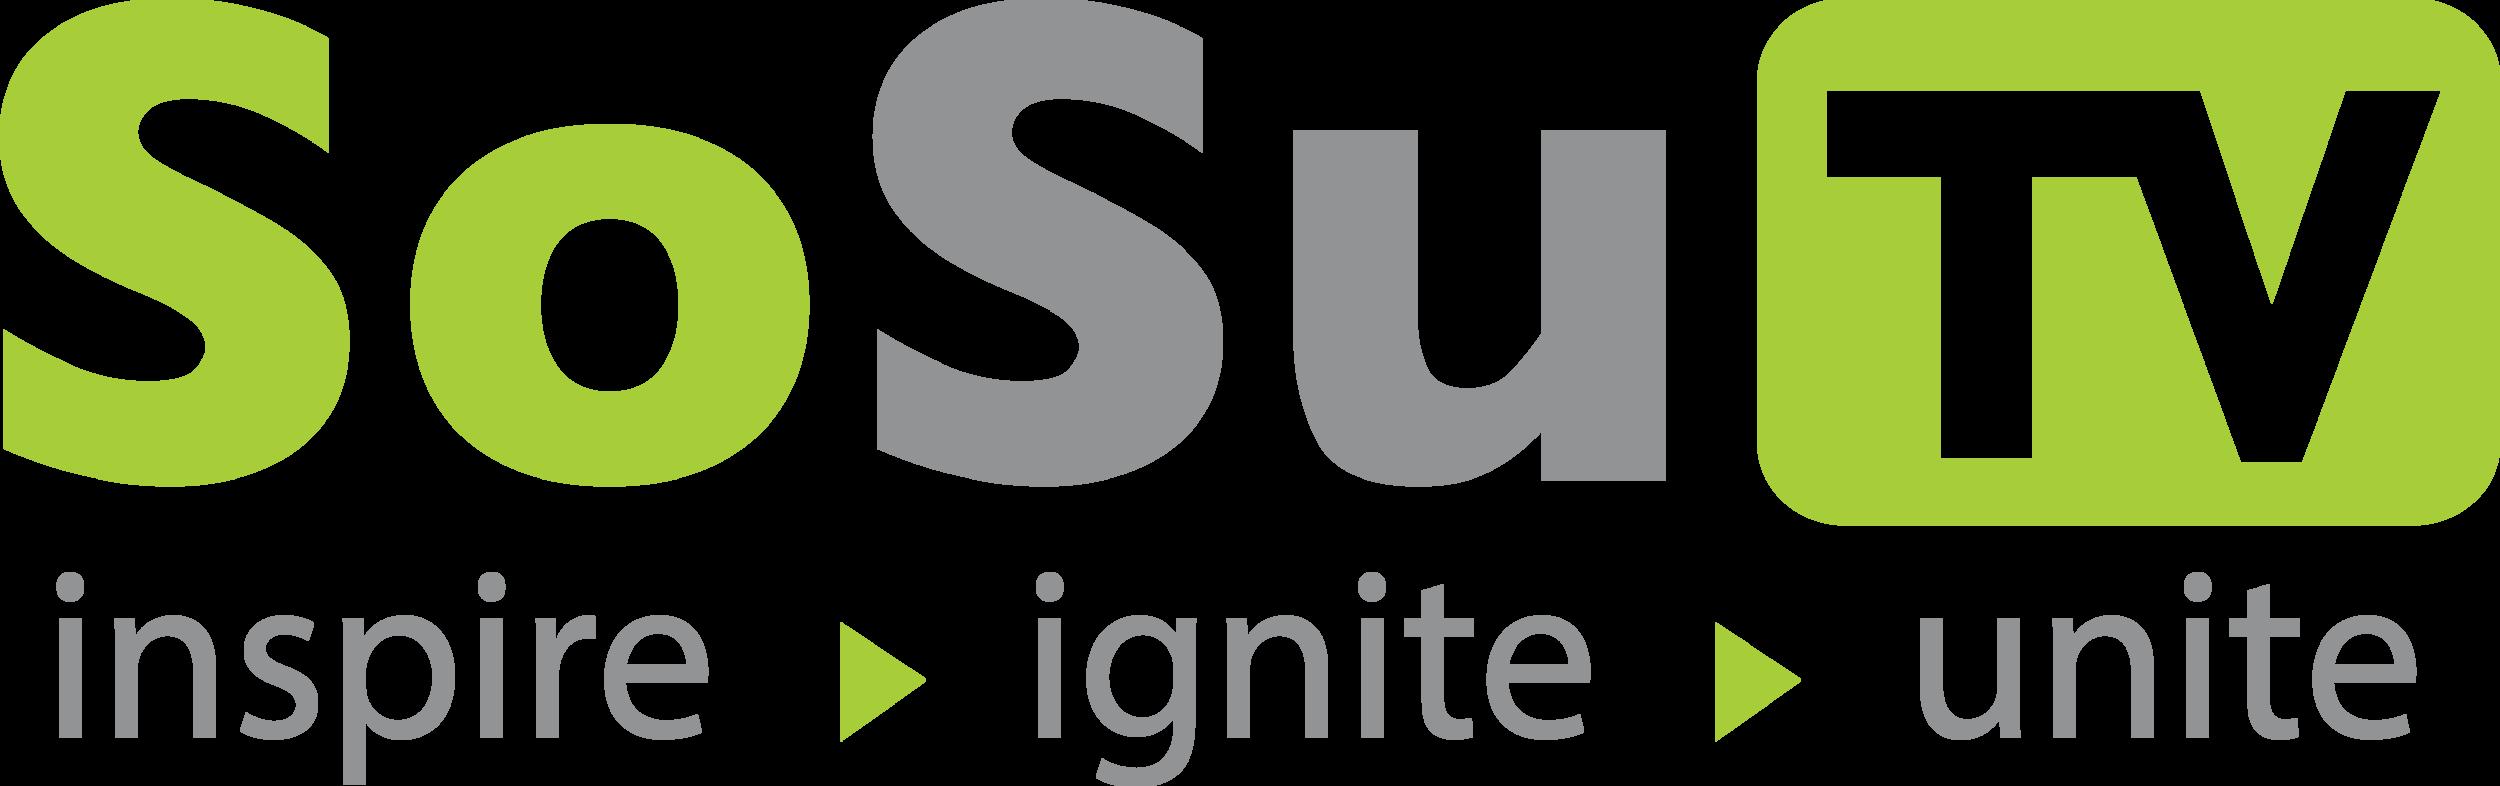 SoSuTV_Logo.png